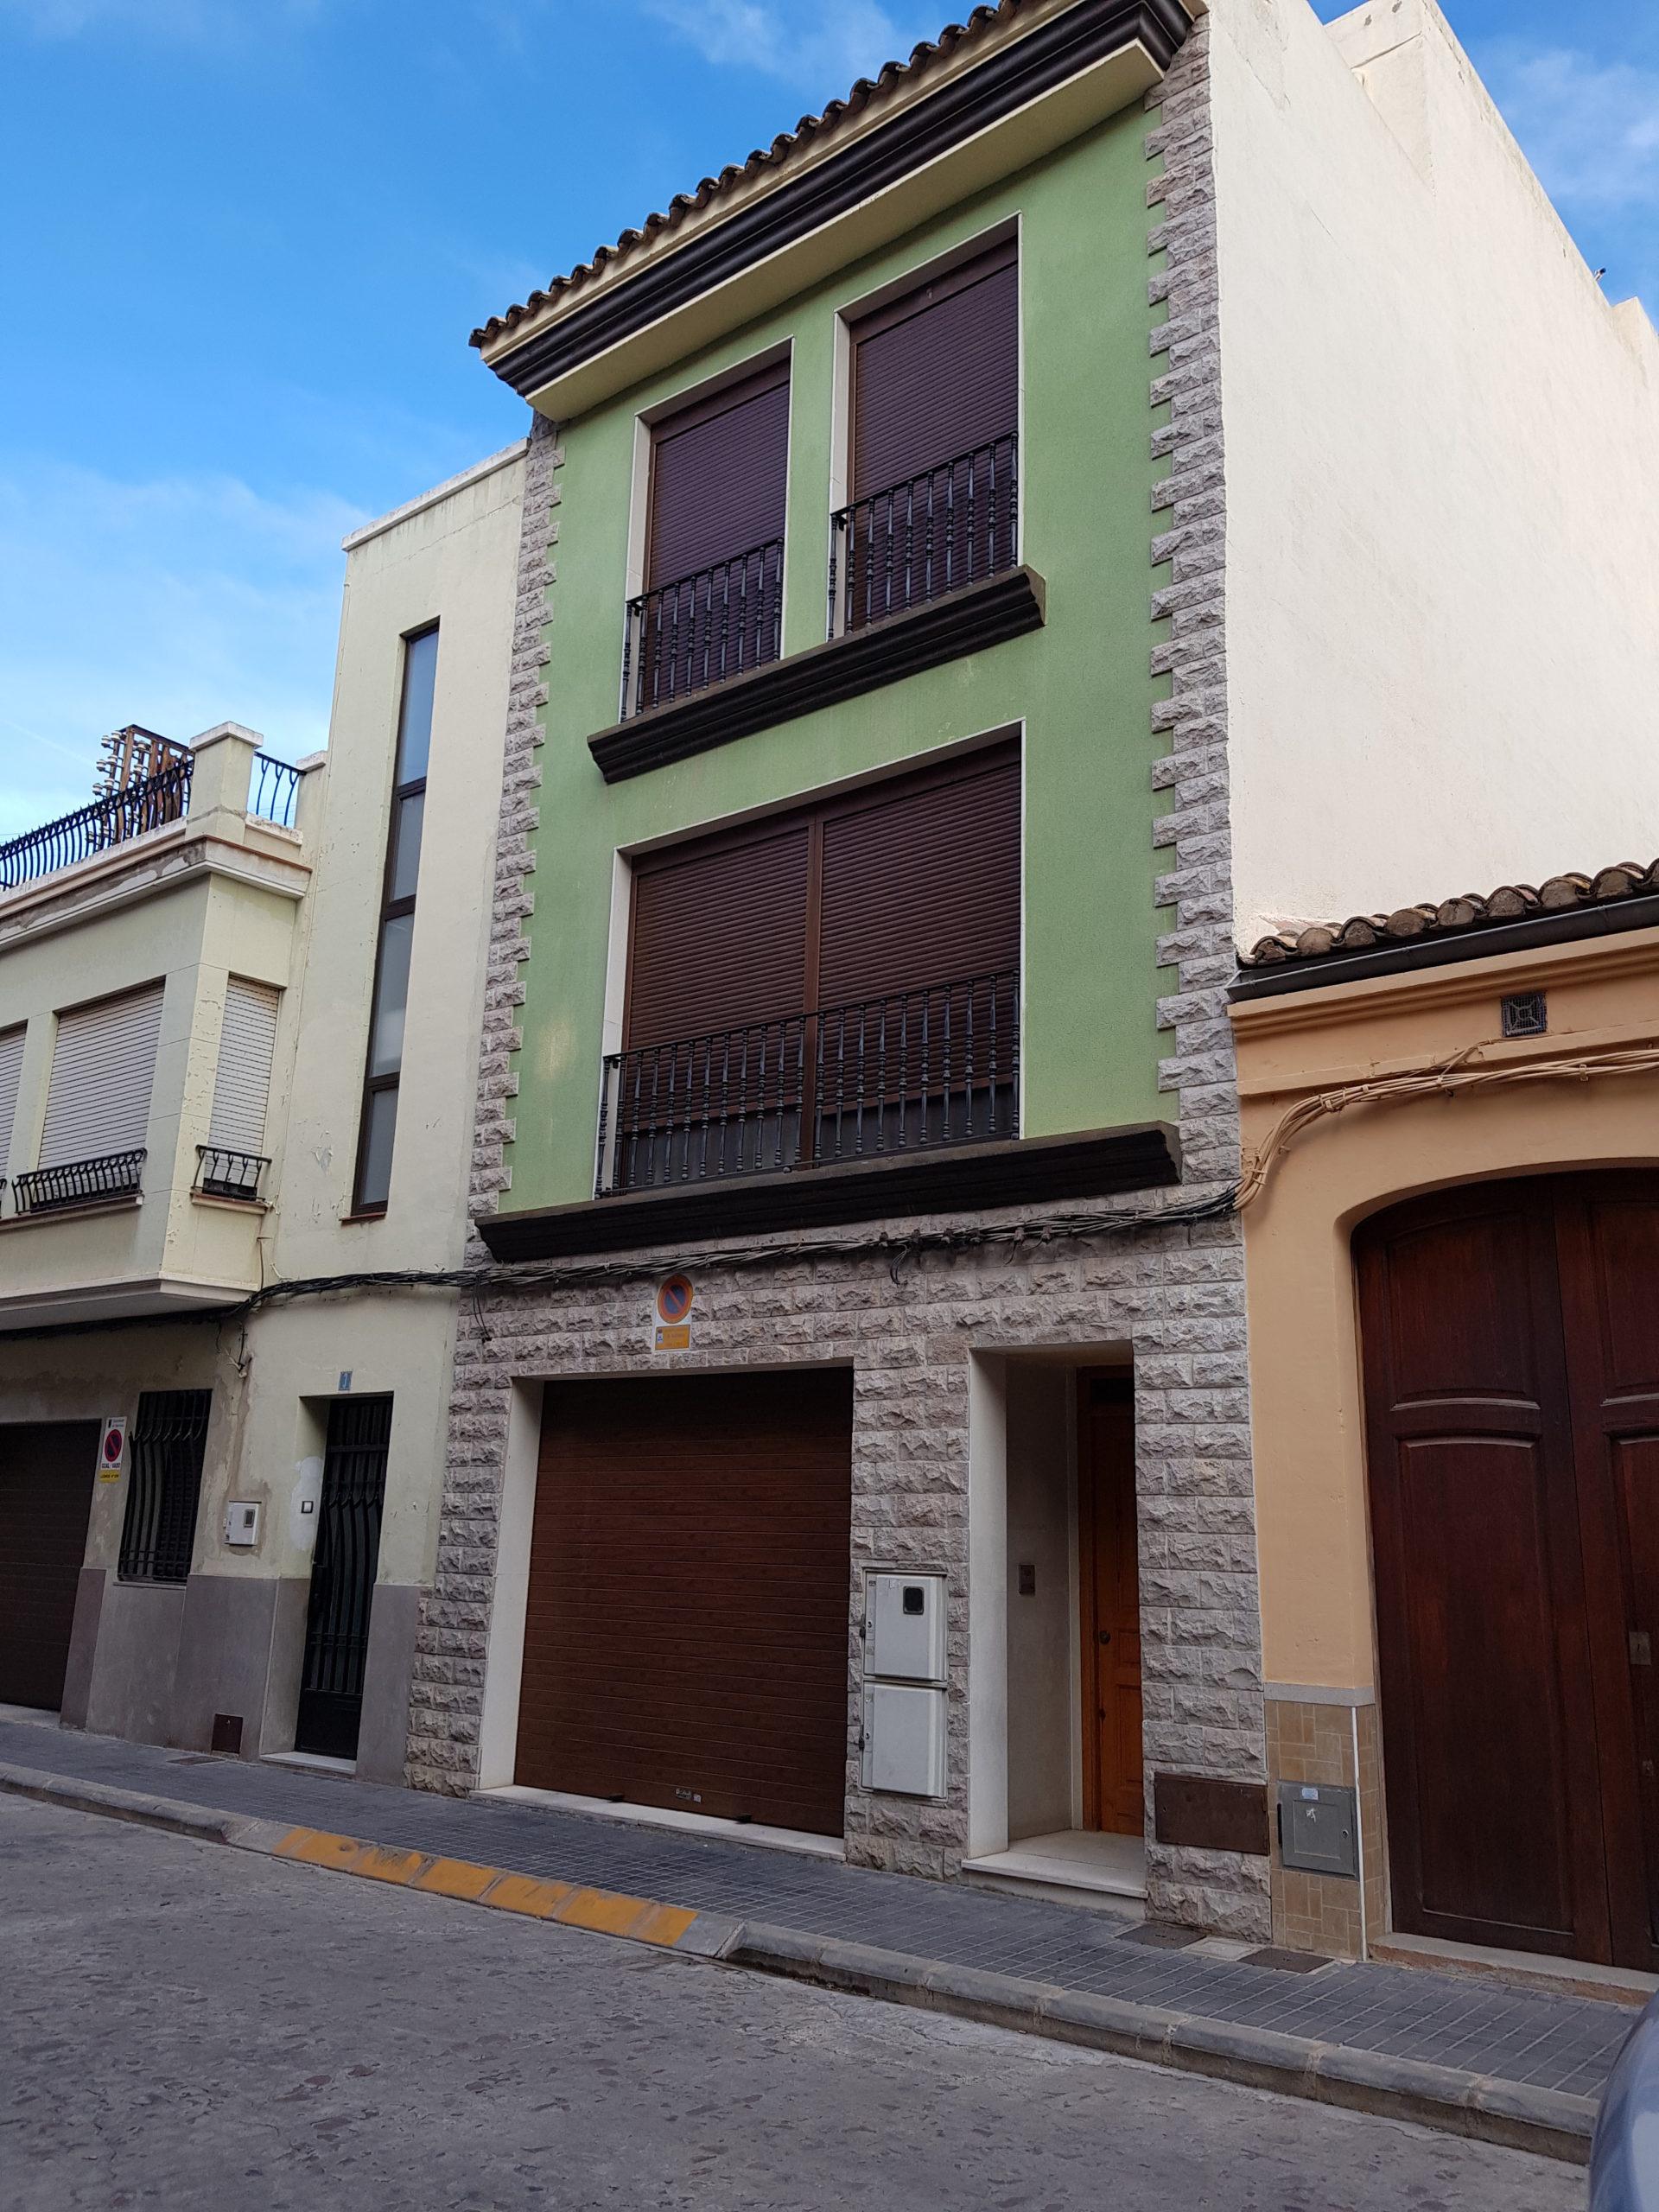 Venta de Casa Unifamiliar Adosada en Burriana (Castellón) Zona Centro